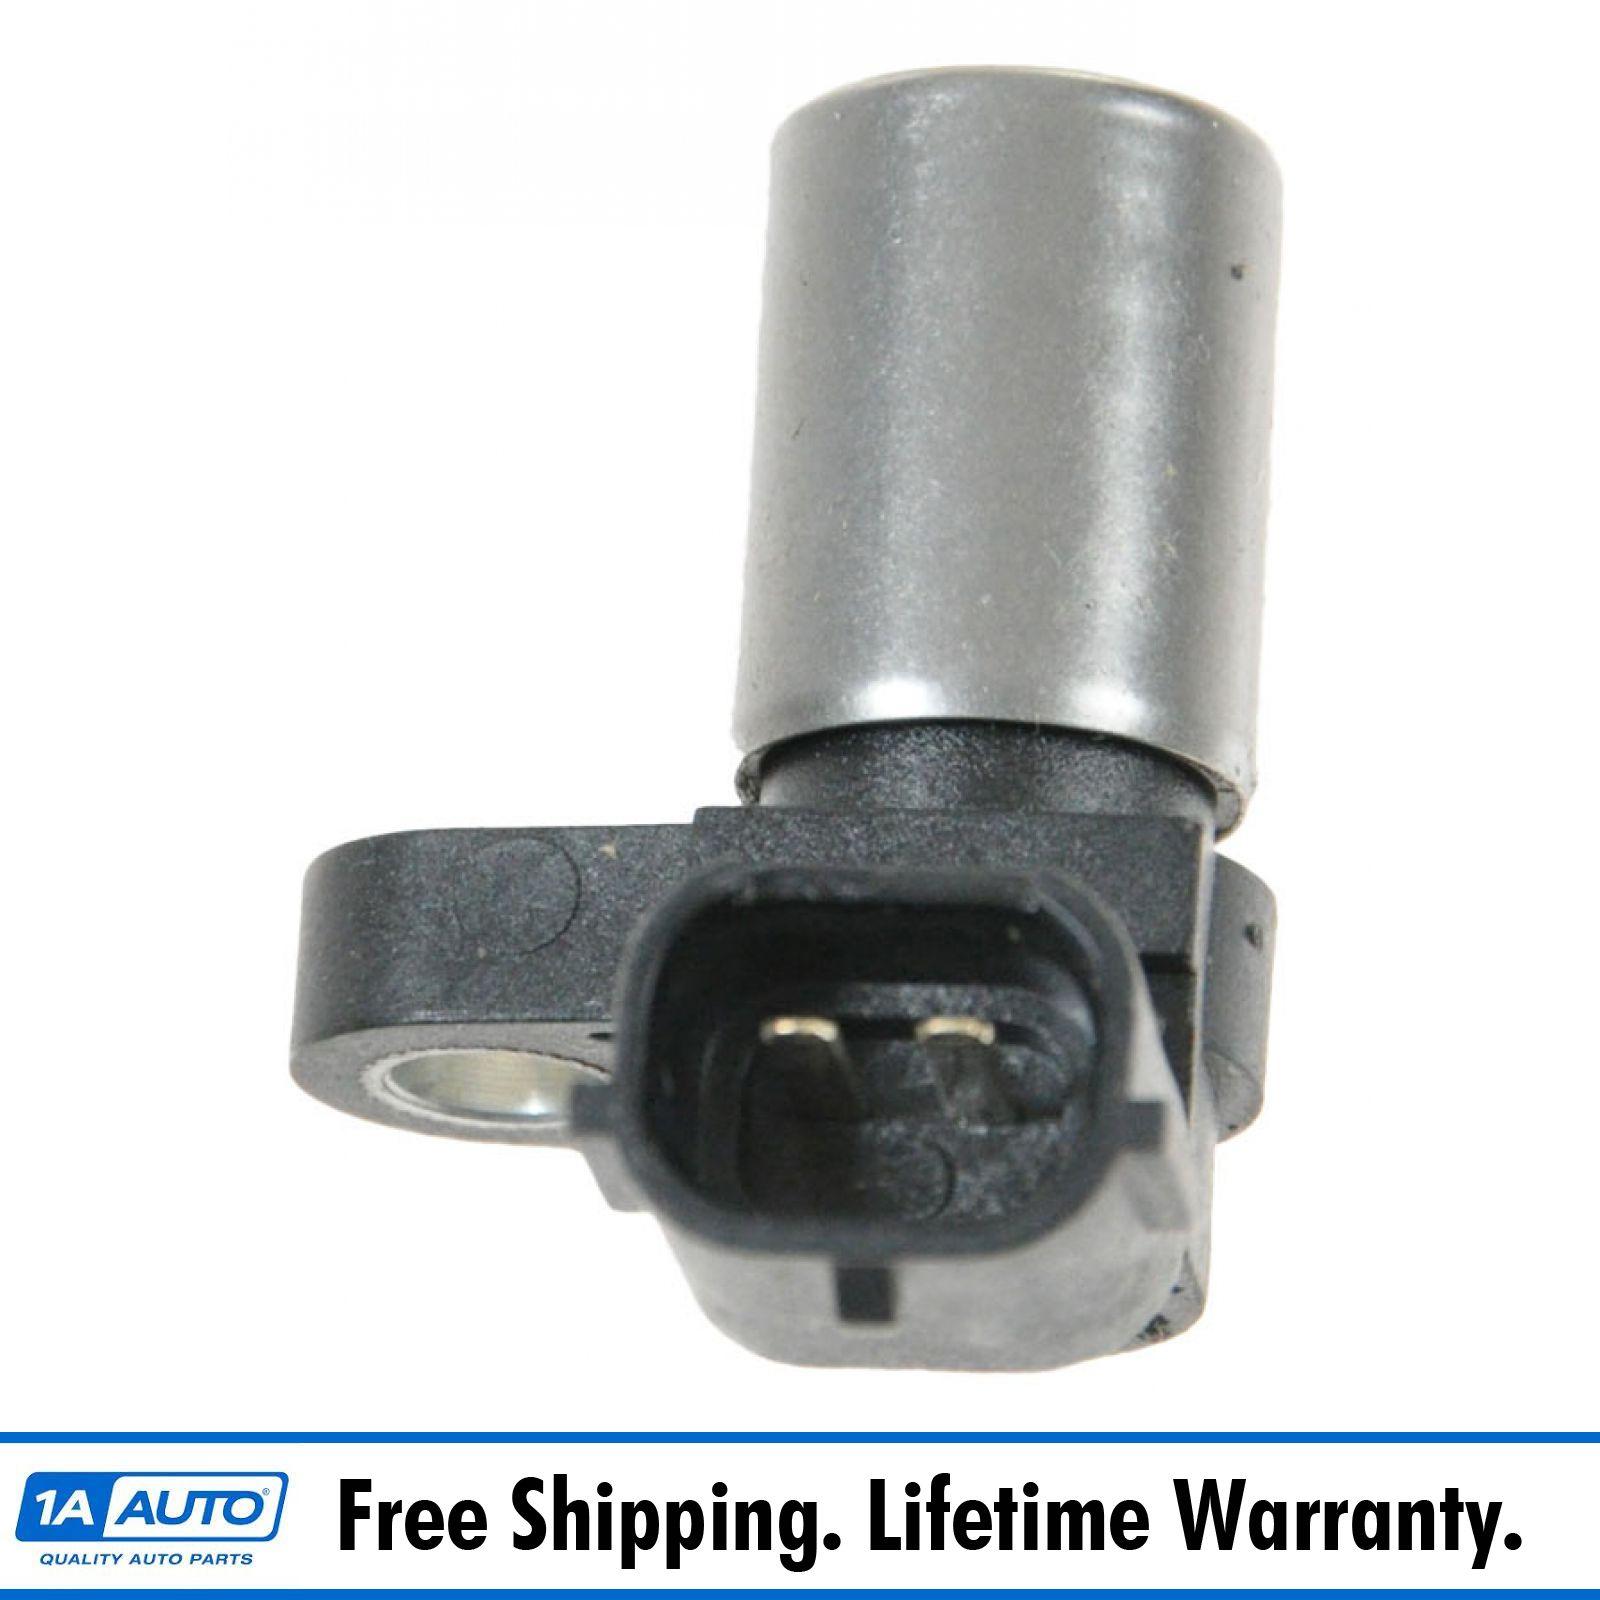 Crankshaft Crank Shaft Position Sensor For Scion Subaru H4